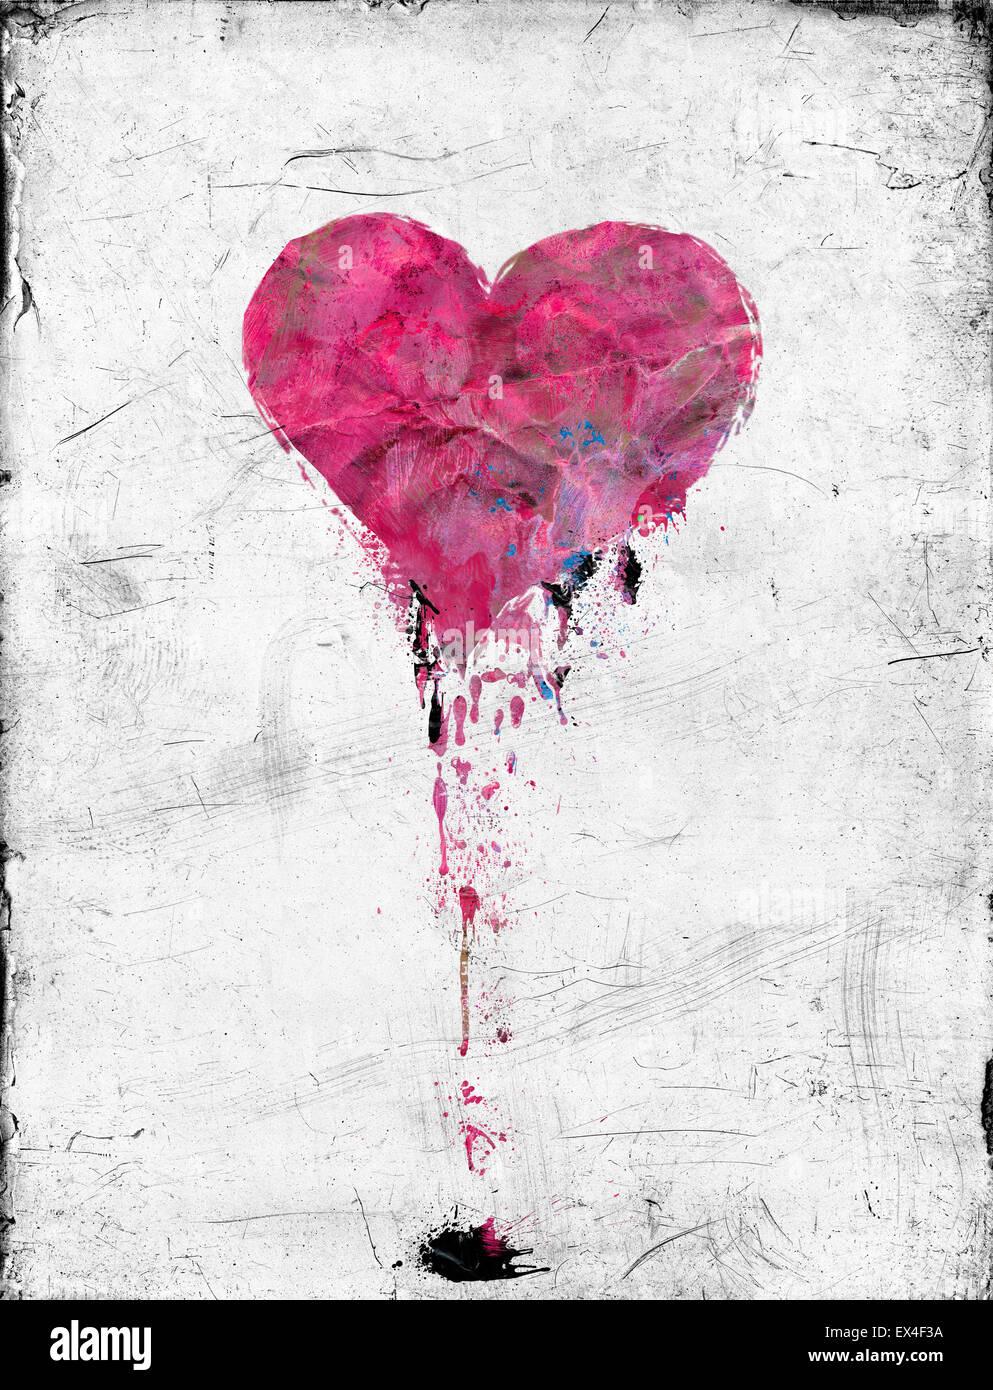 Love lies bleeding - Stock Image